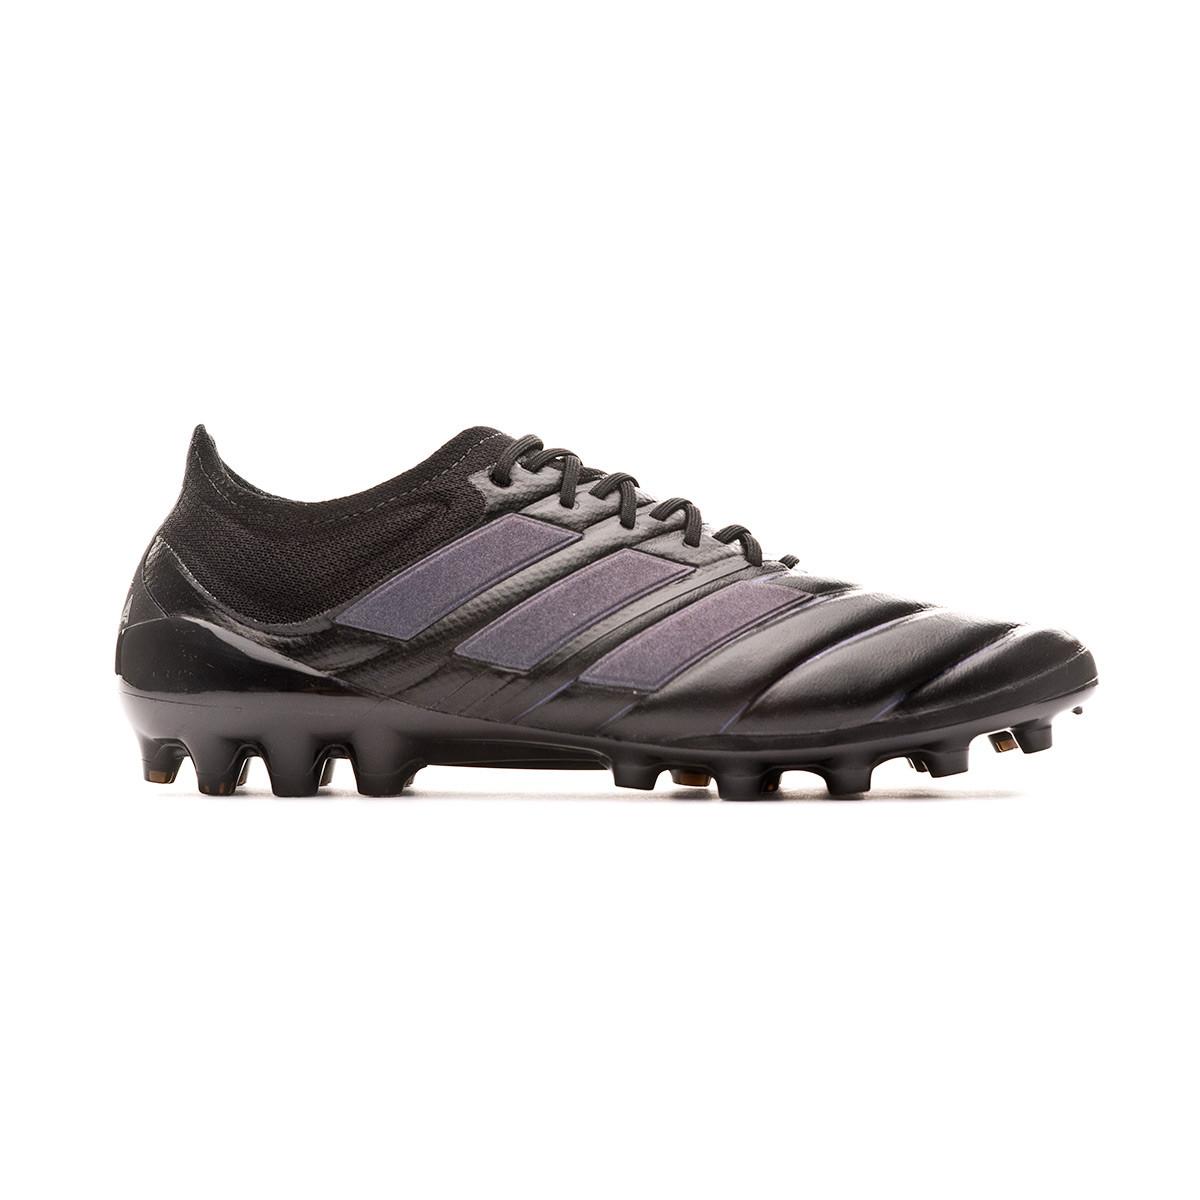 Scarpe adidas Copa 19.1 AG Core black Silver metallic